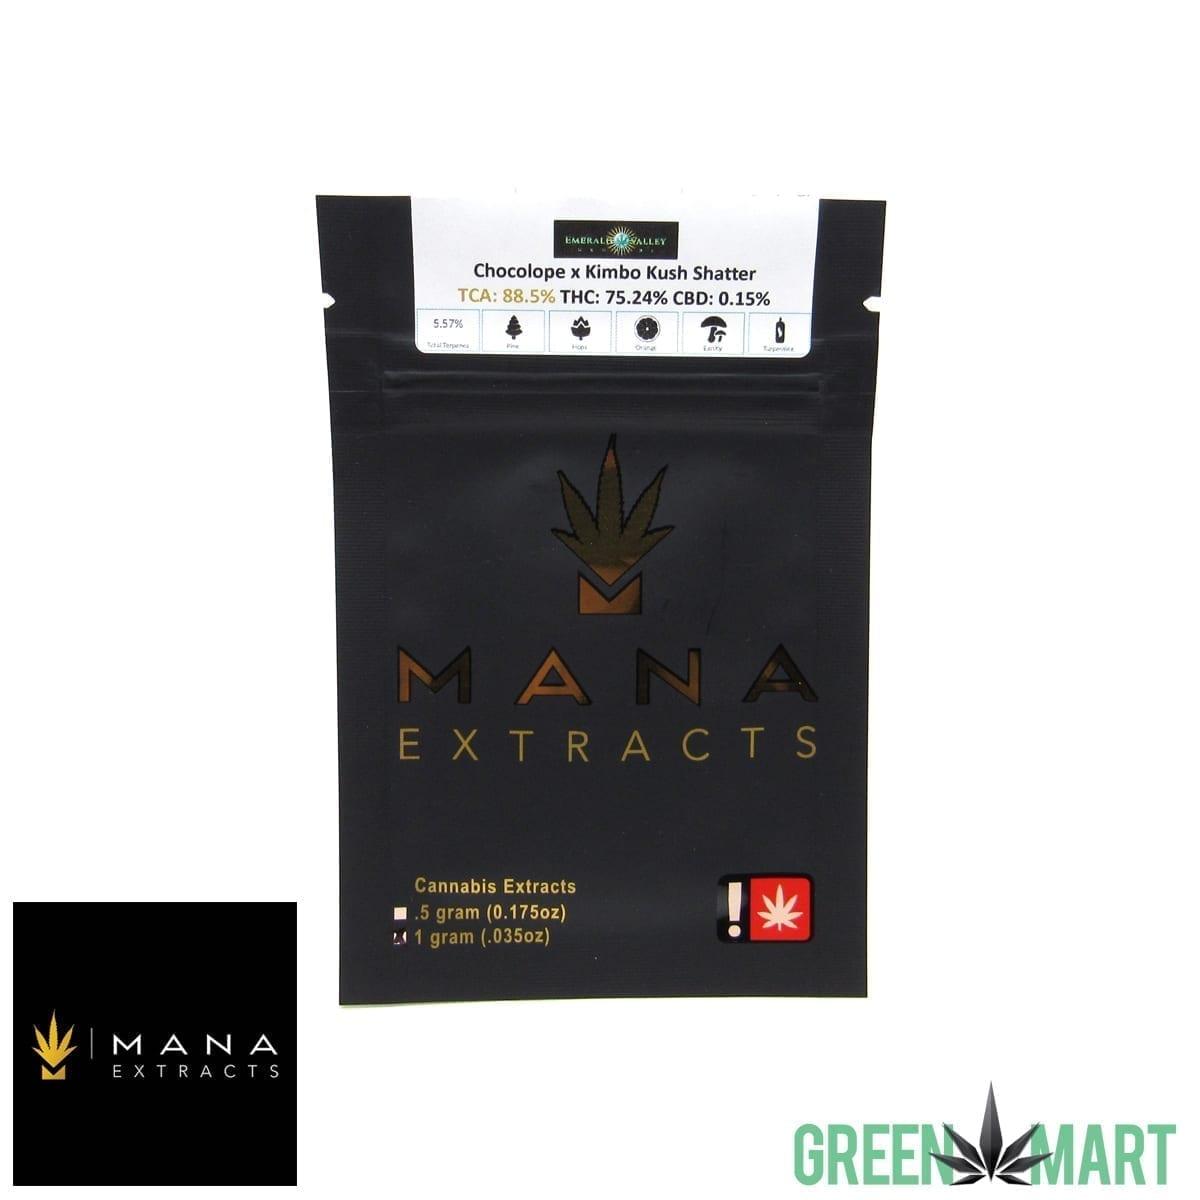 Mana Extracts - Chocolope X Kimbo Kush Shatter